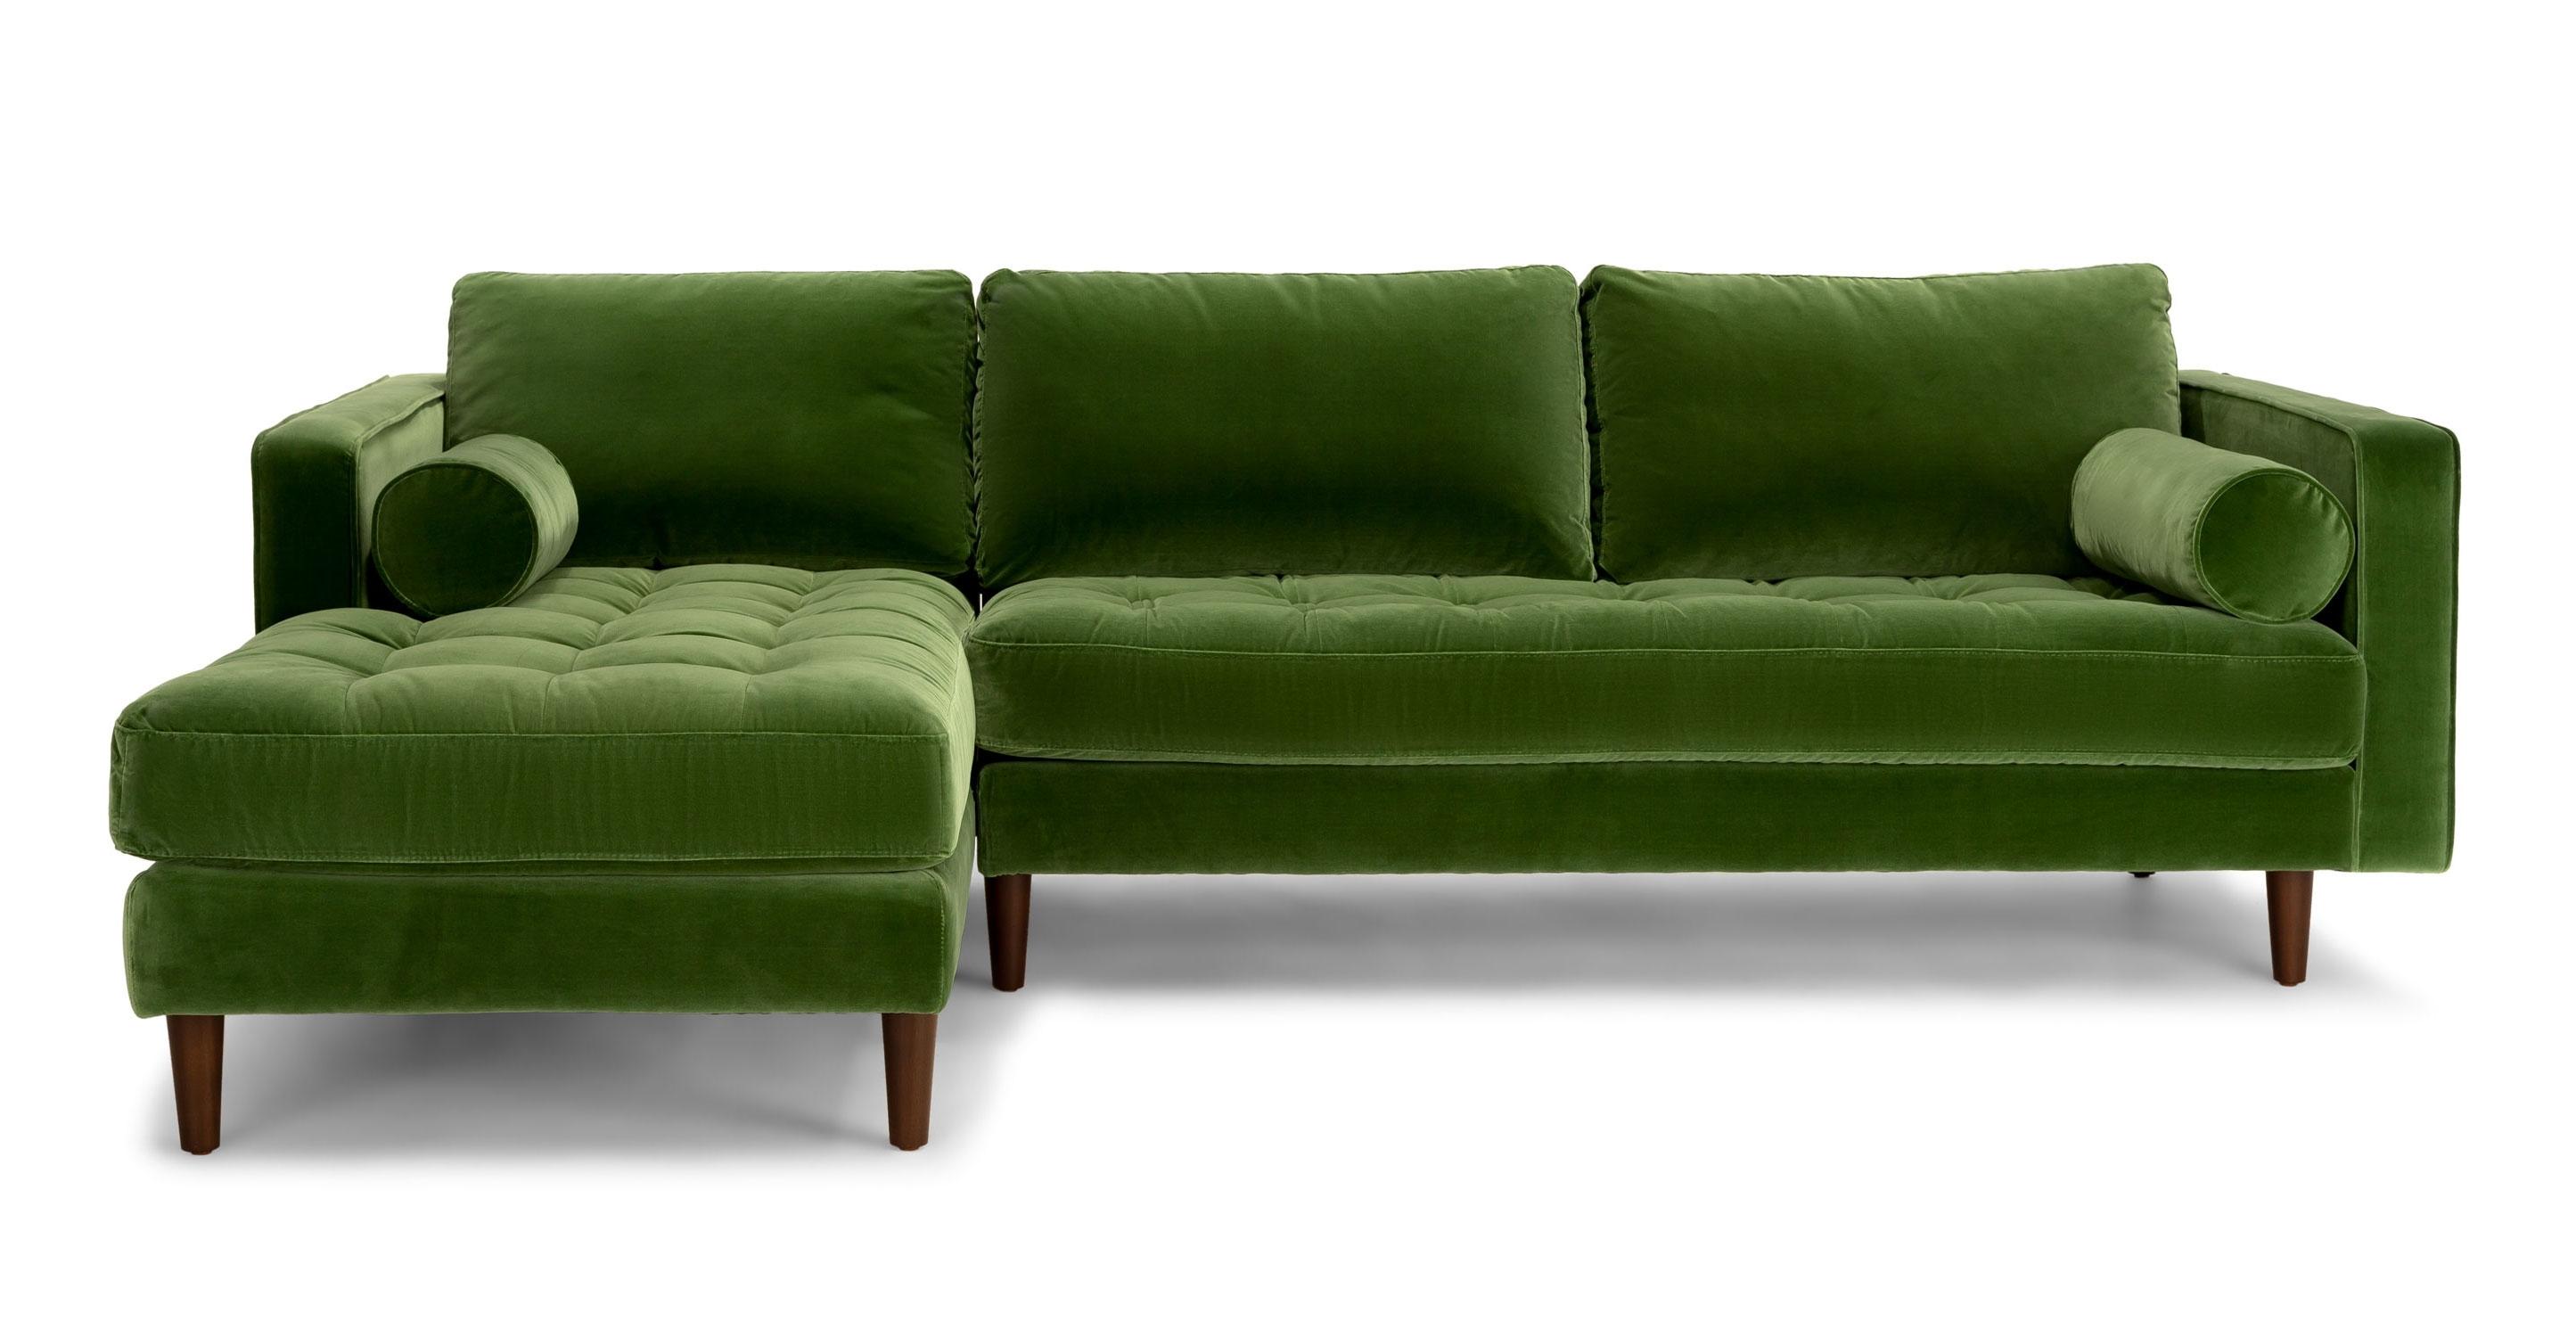 Small Sectional Sofa Raymour And Flanigan